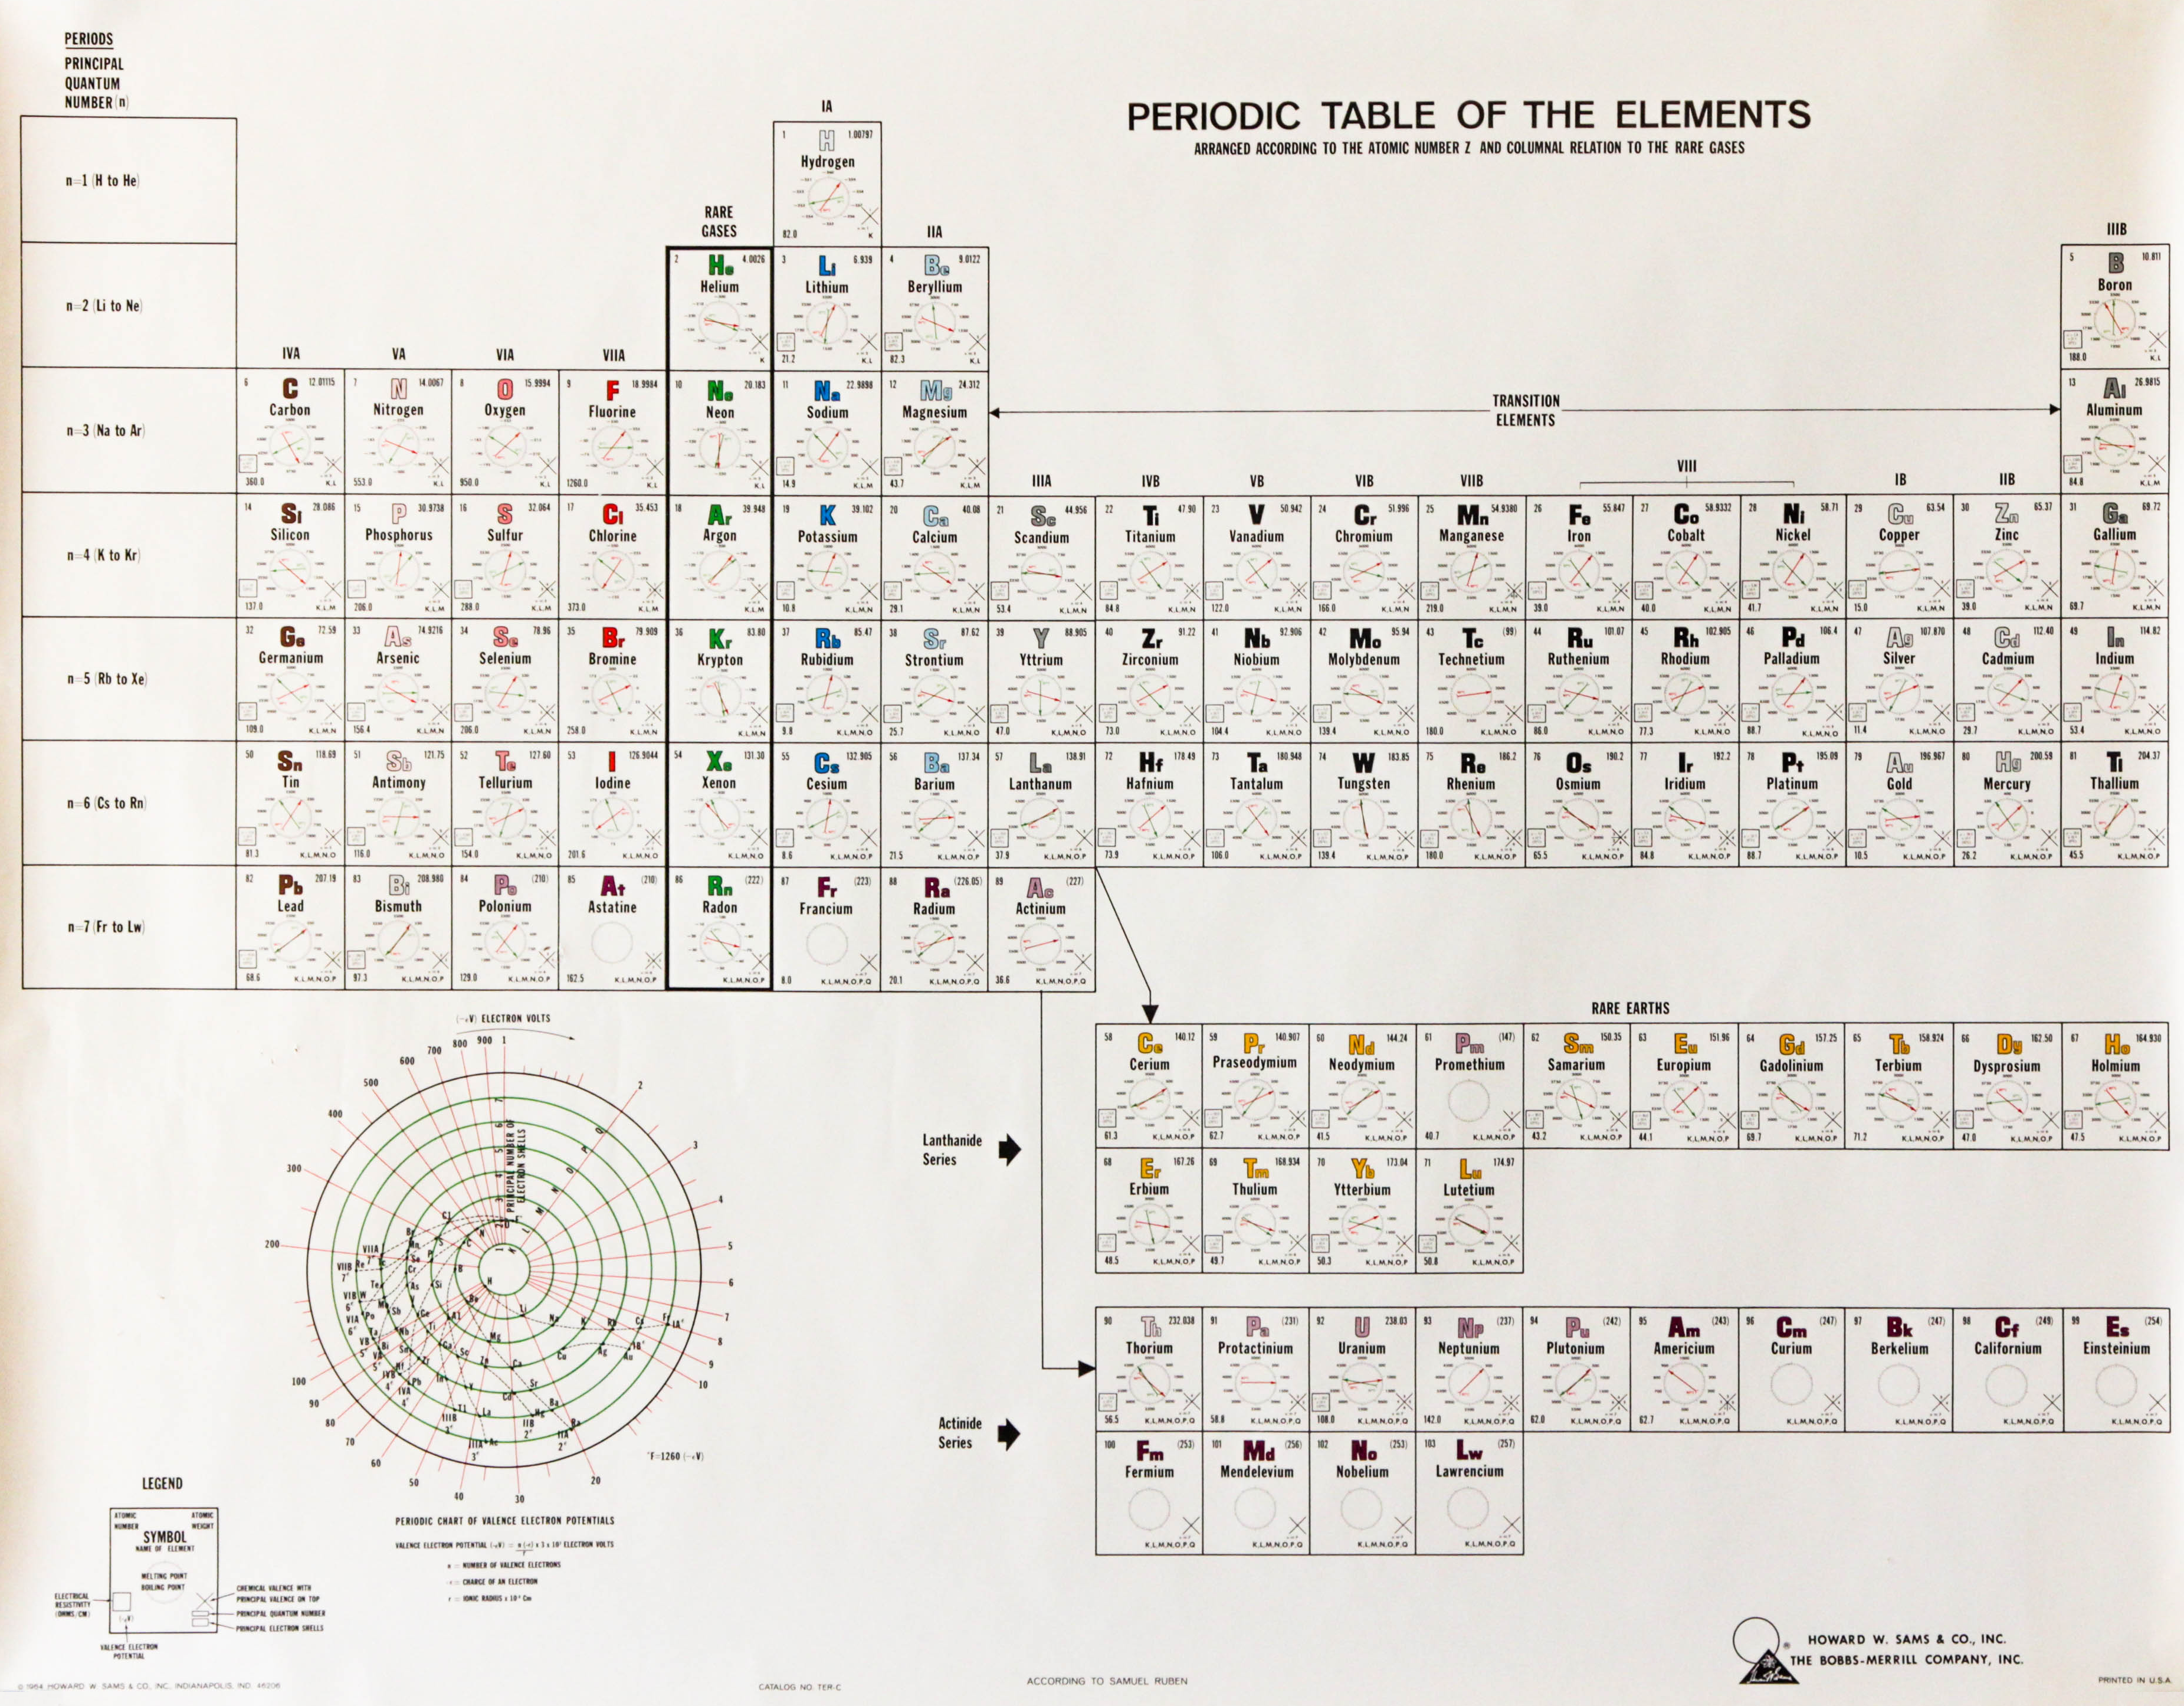 Periodic table database chemogenesis samuel ruben periodic table gamestrikefo Gallery